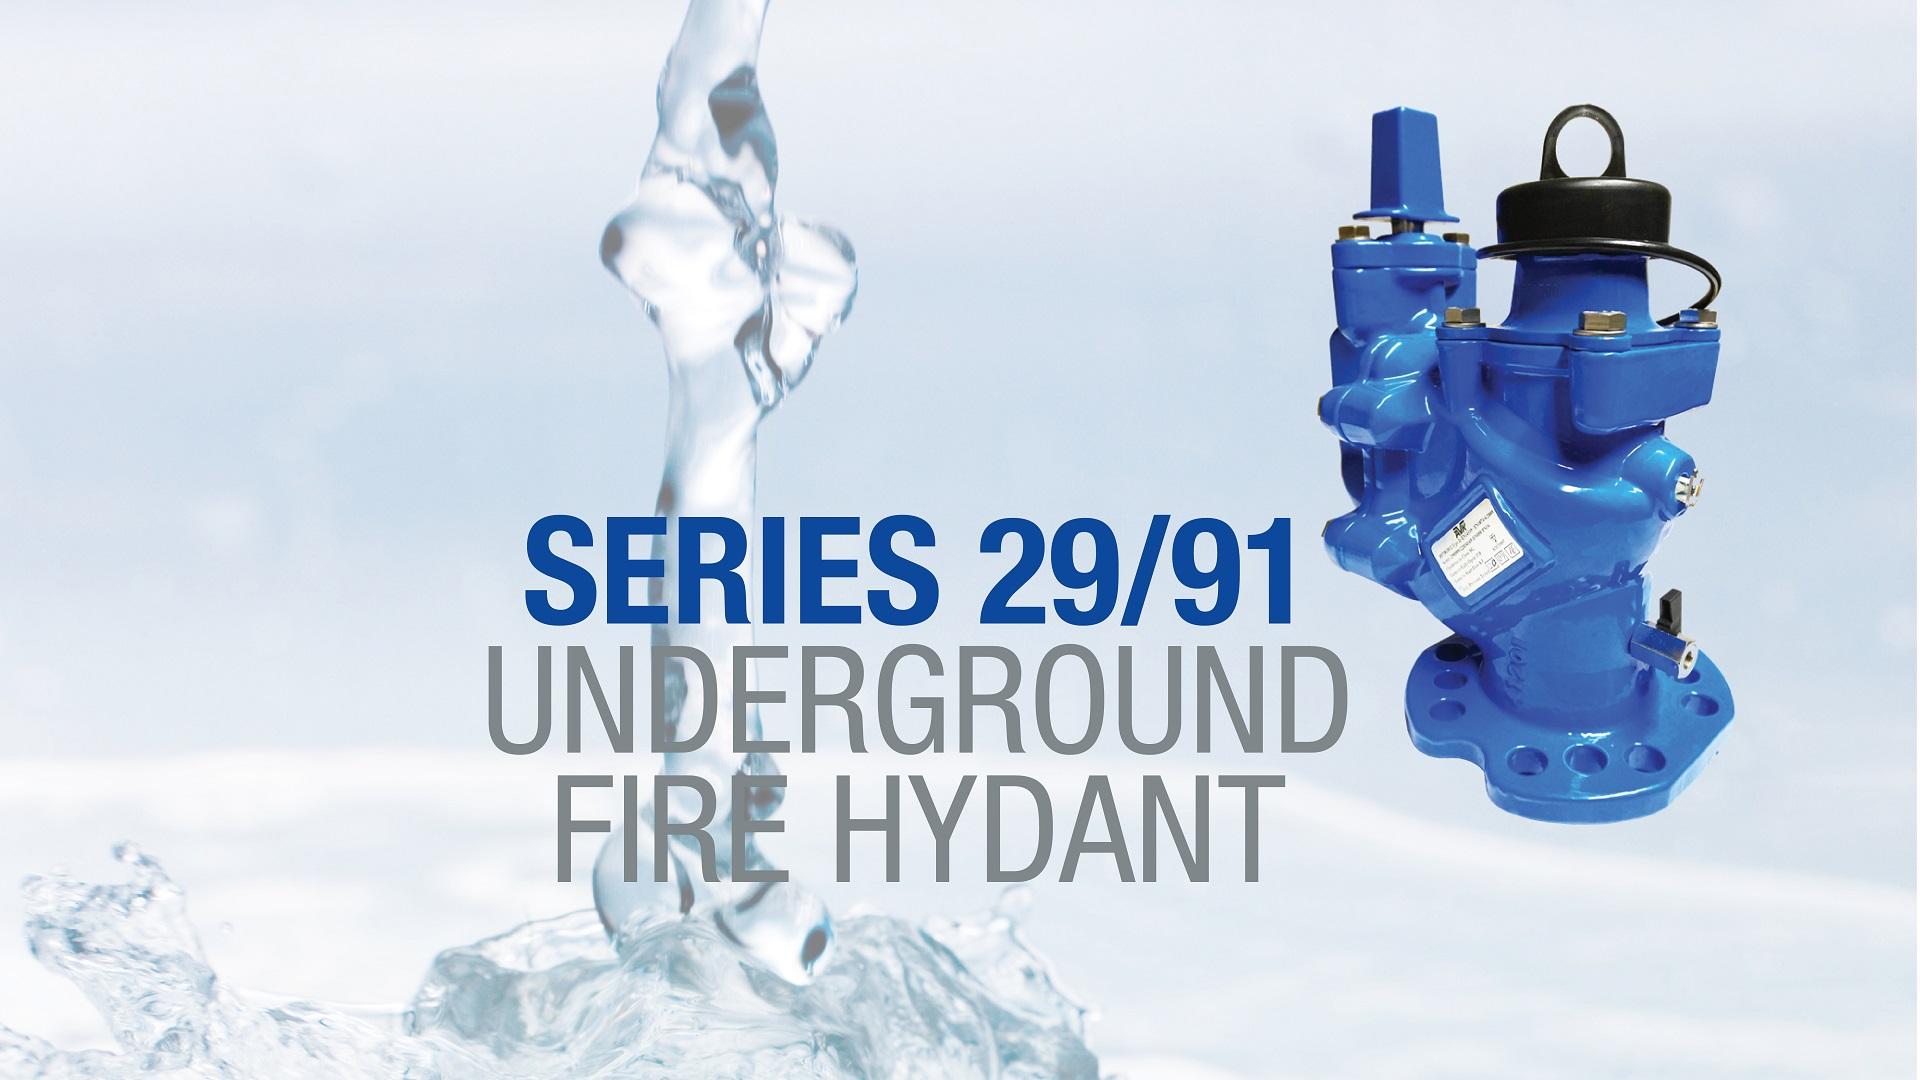 Series 29 91 Hydrant